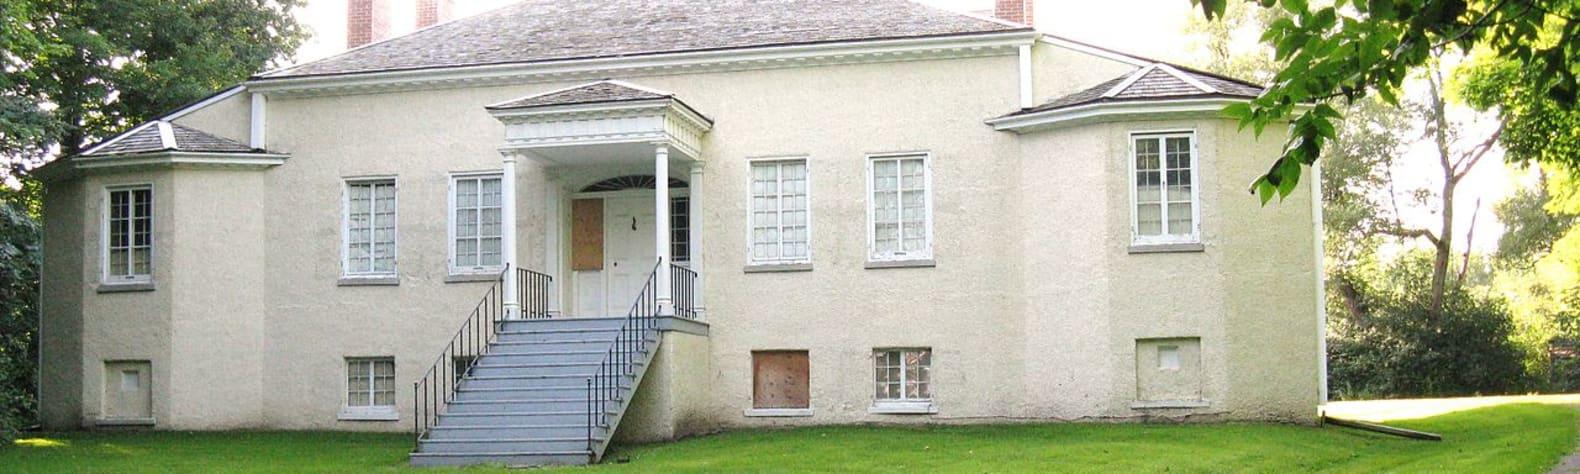 Inverarden House National Historic Site